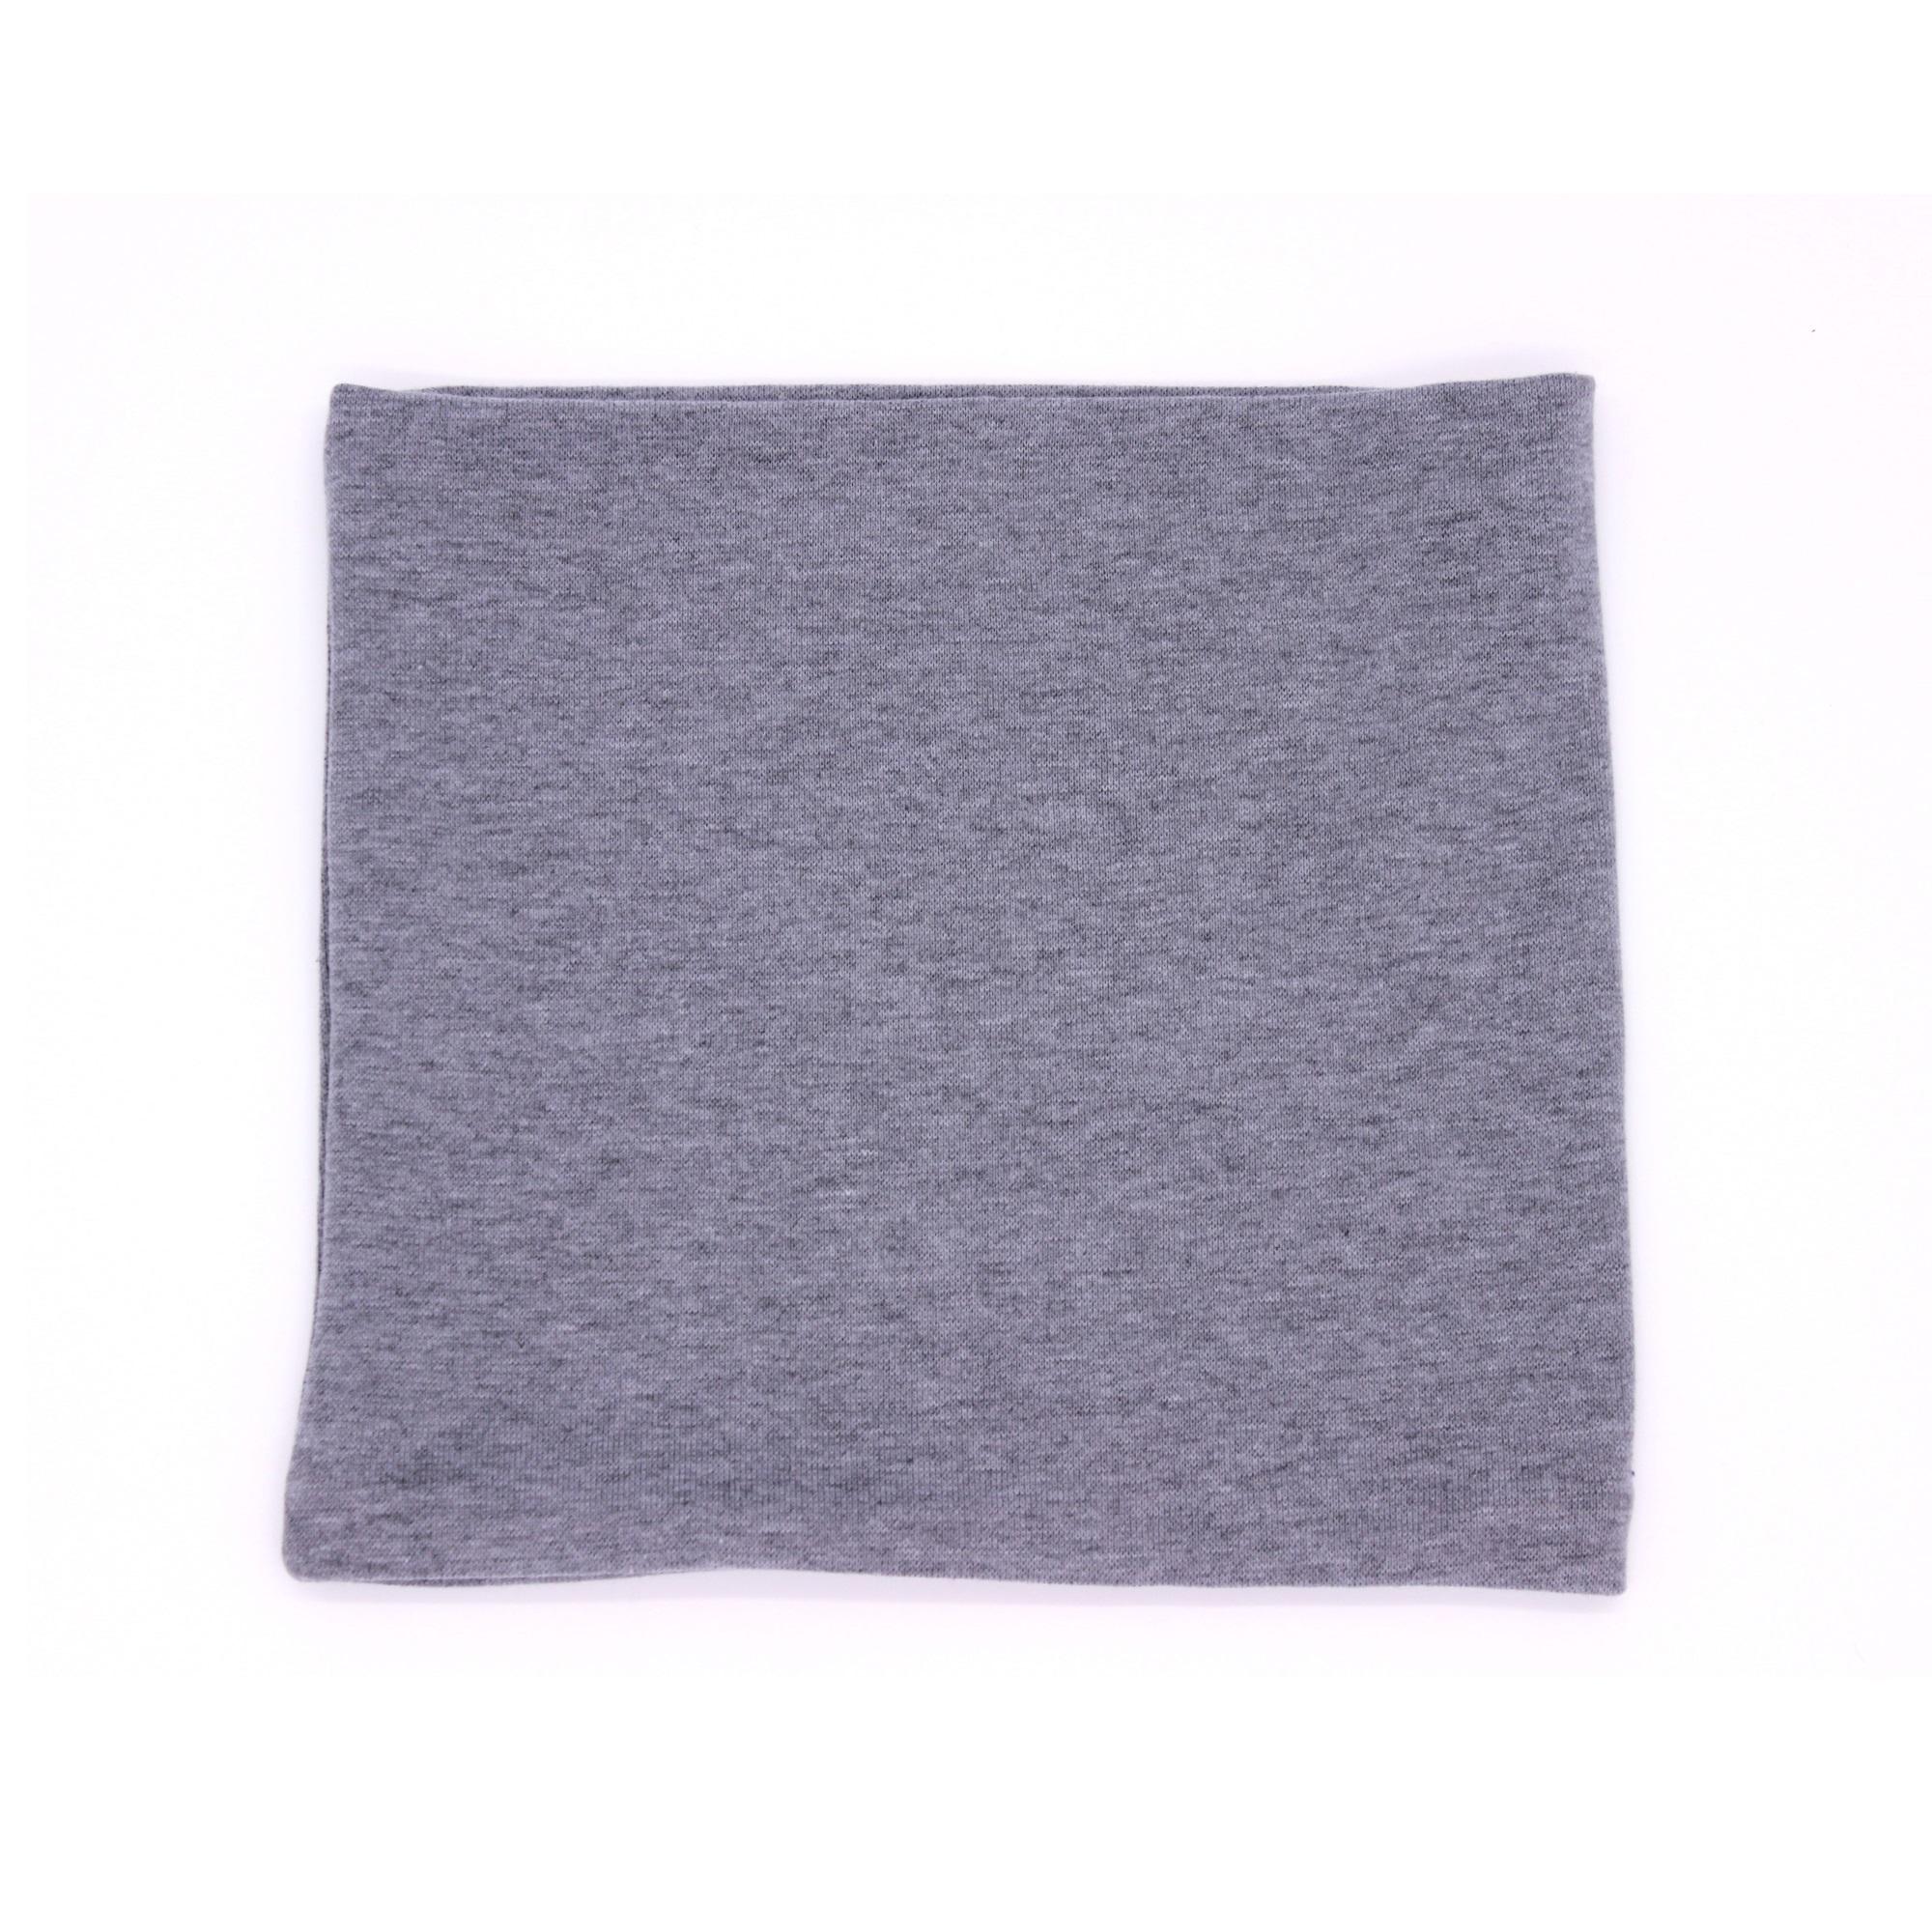 Шарф Nais, цвет: серый р.50-52 ДС.Снуд (серый т. меланж)